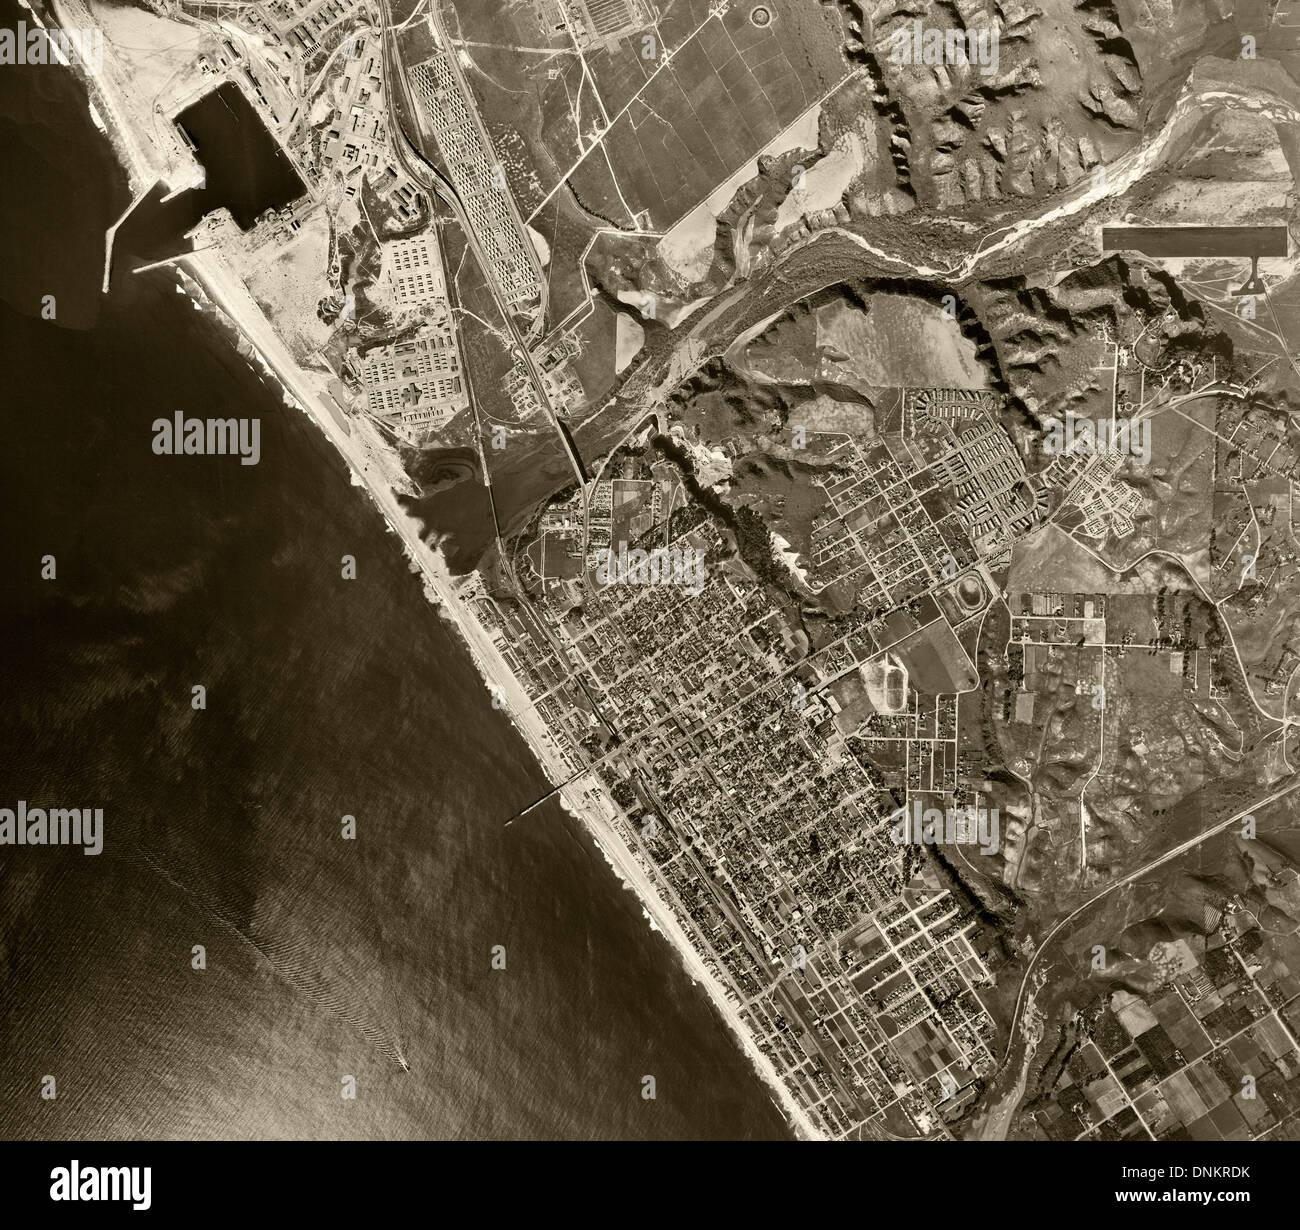 historical aerial photograph Oceanside, California, 1946 - Stock Image